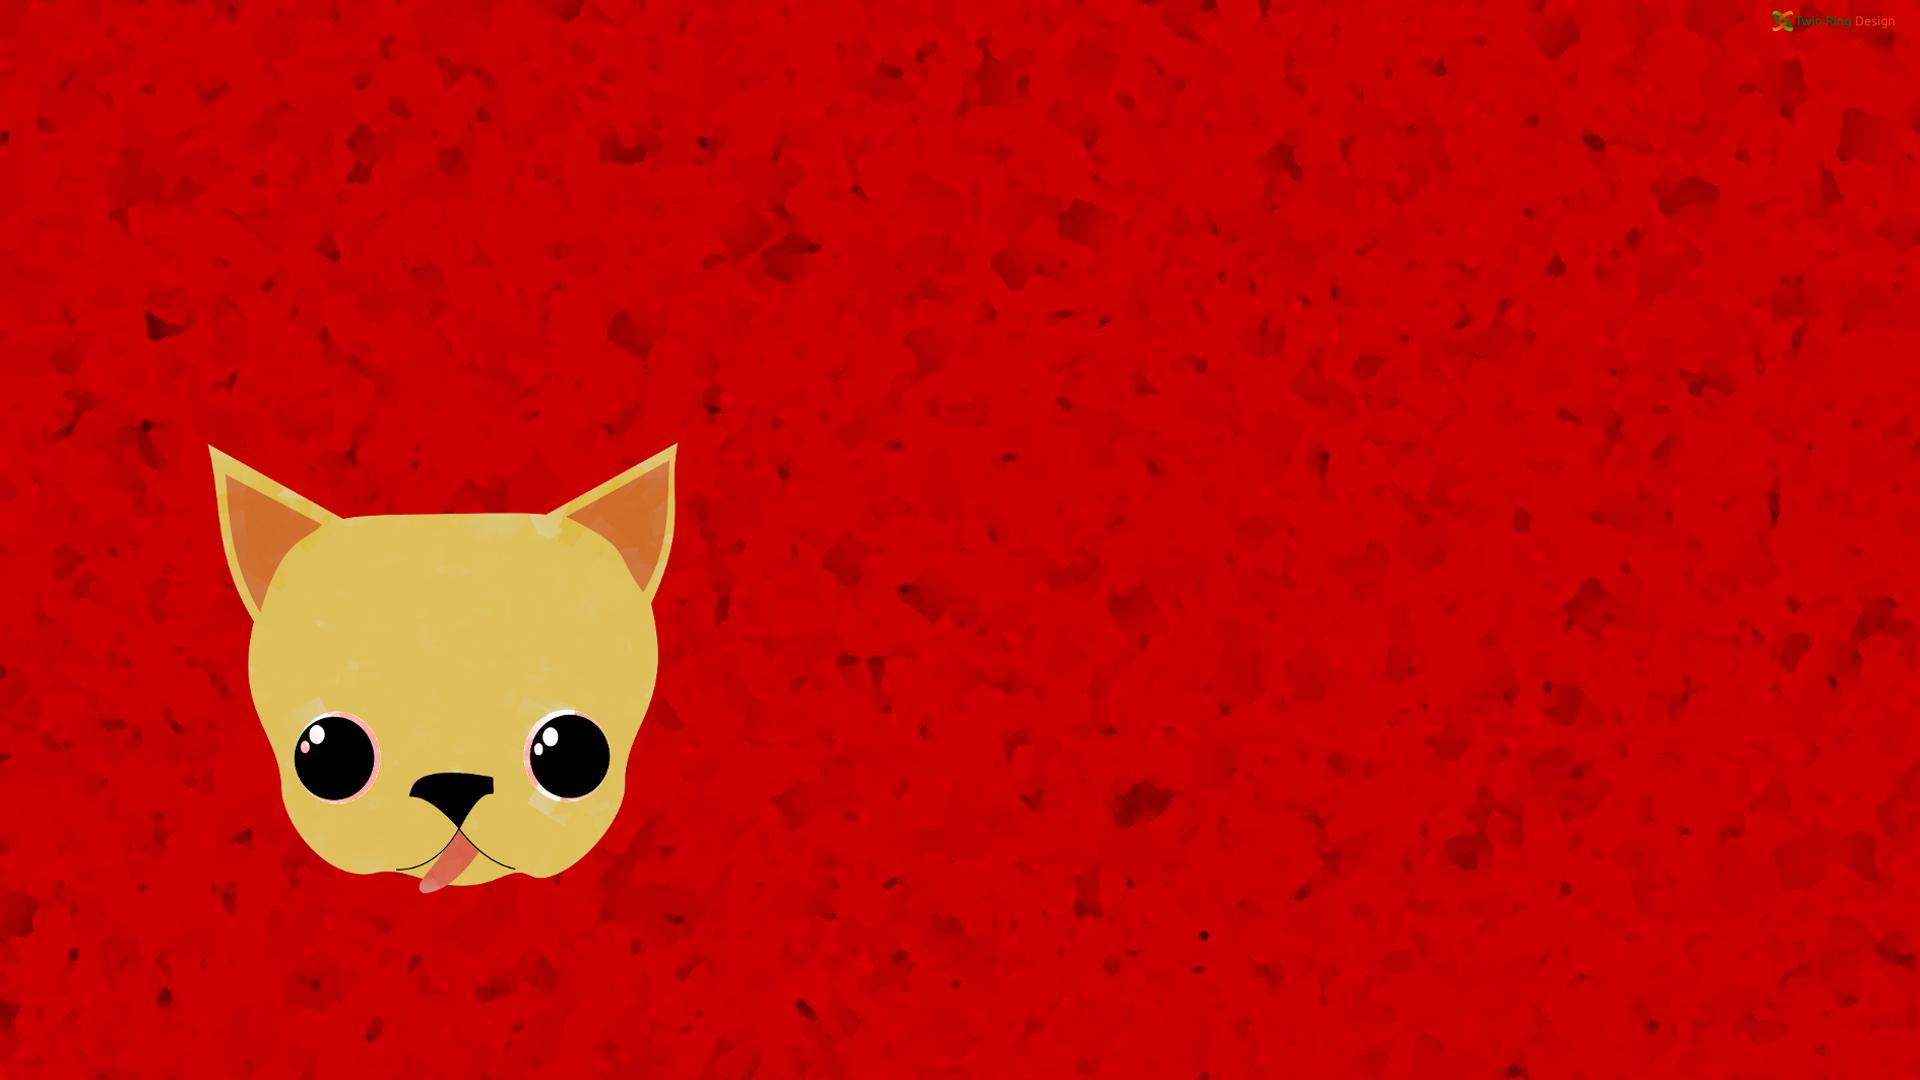 Tapety Ilustrace Kocka Cervene Kreslena Pohadka Pes Civava